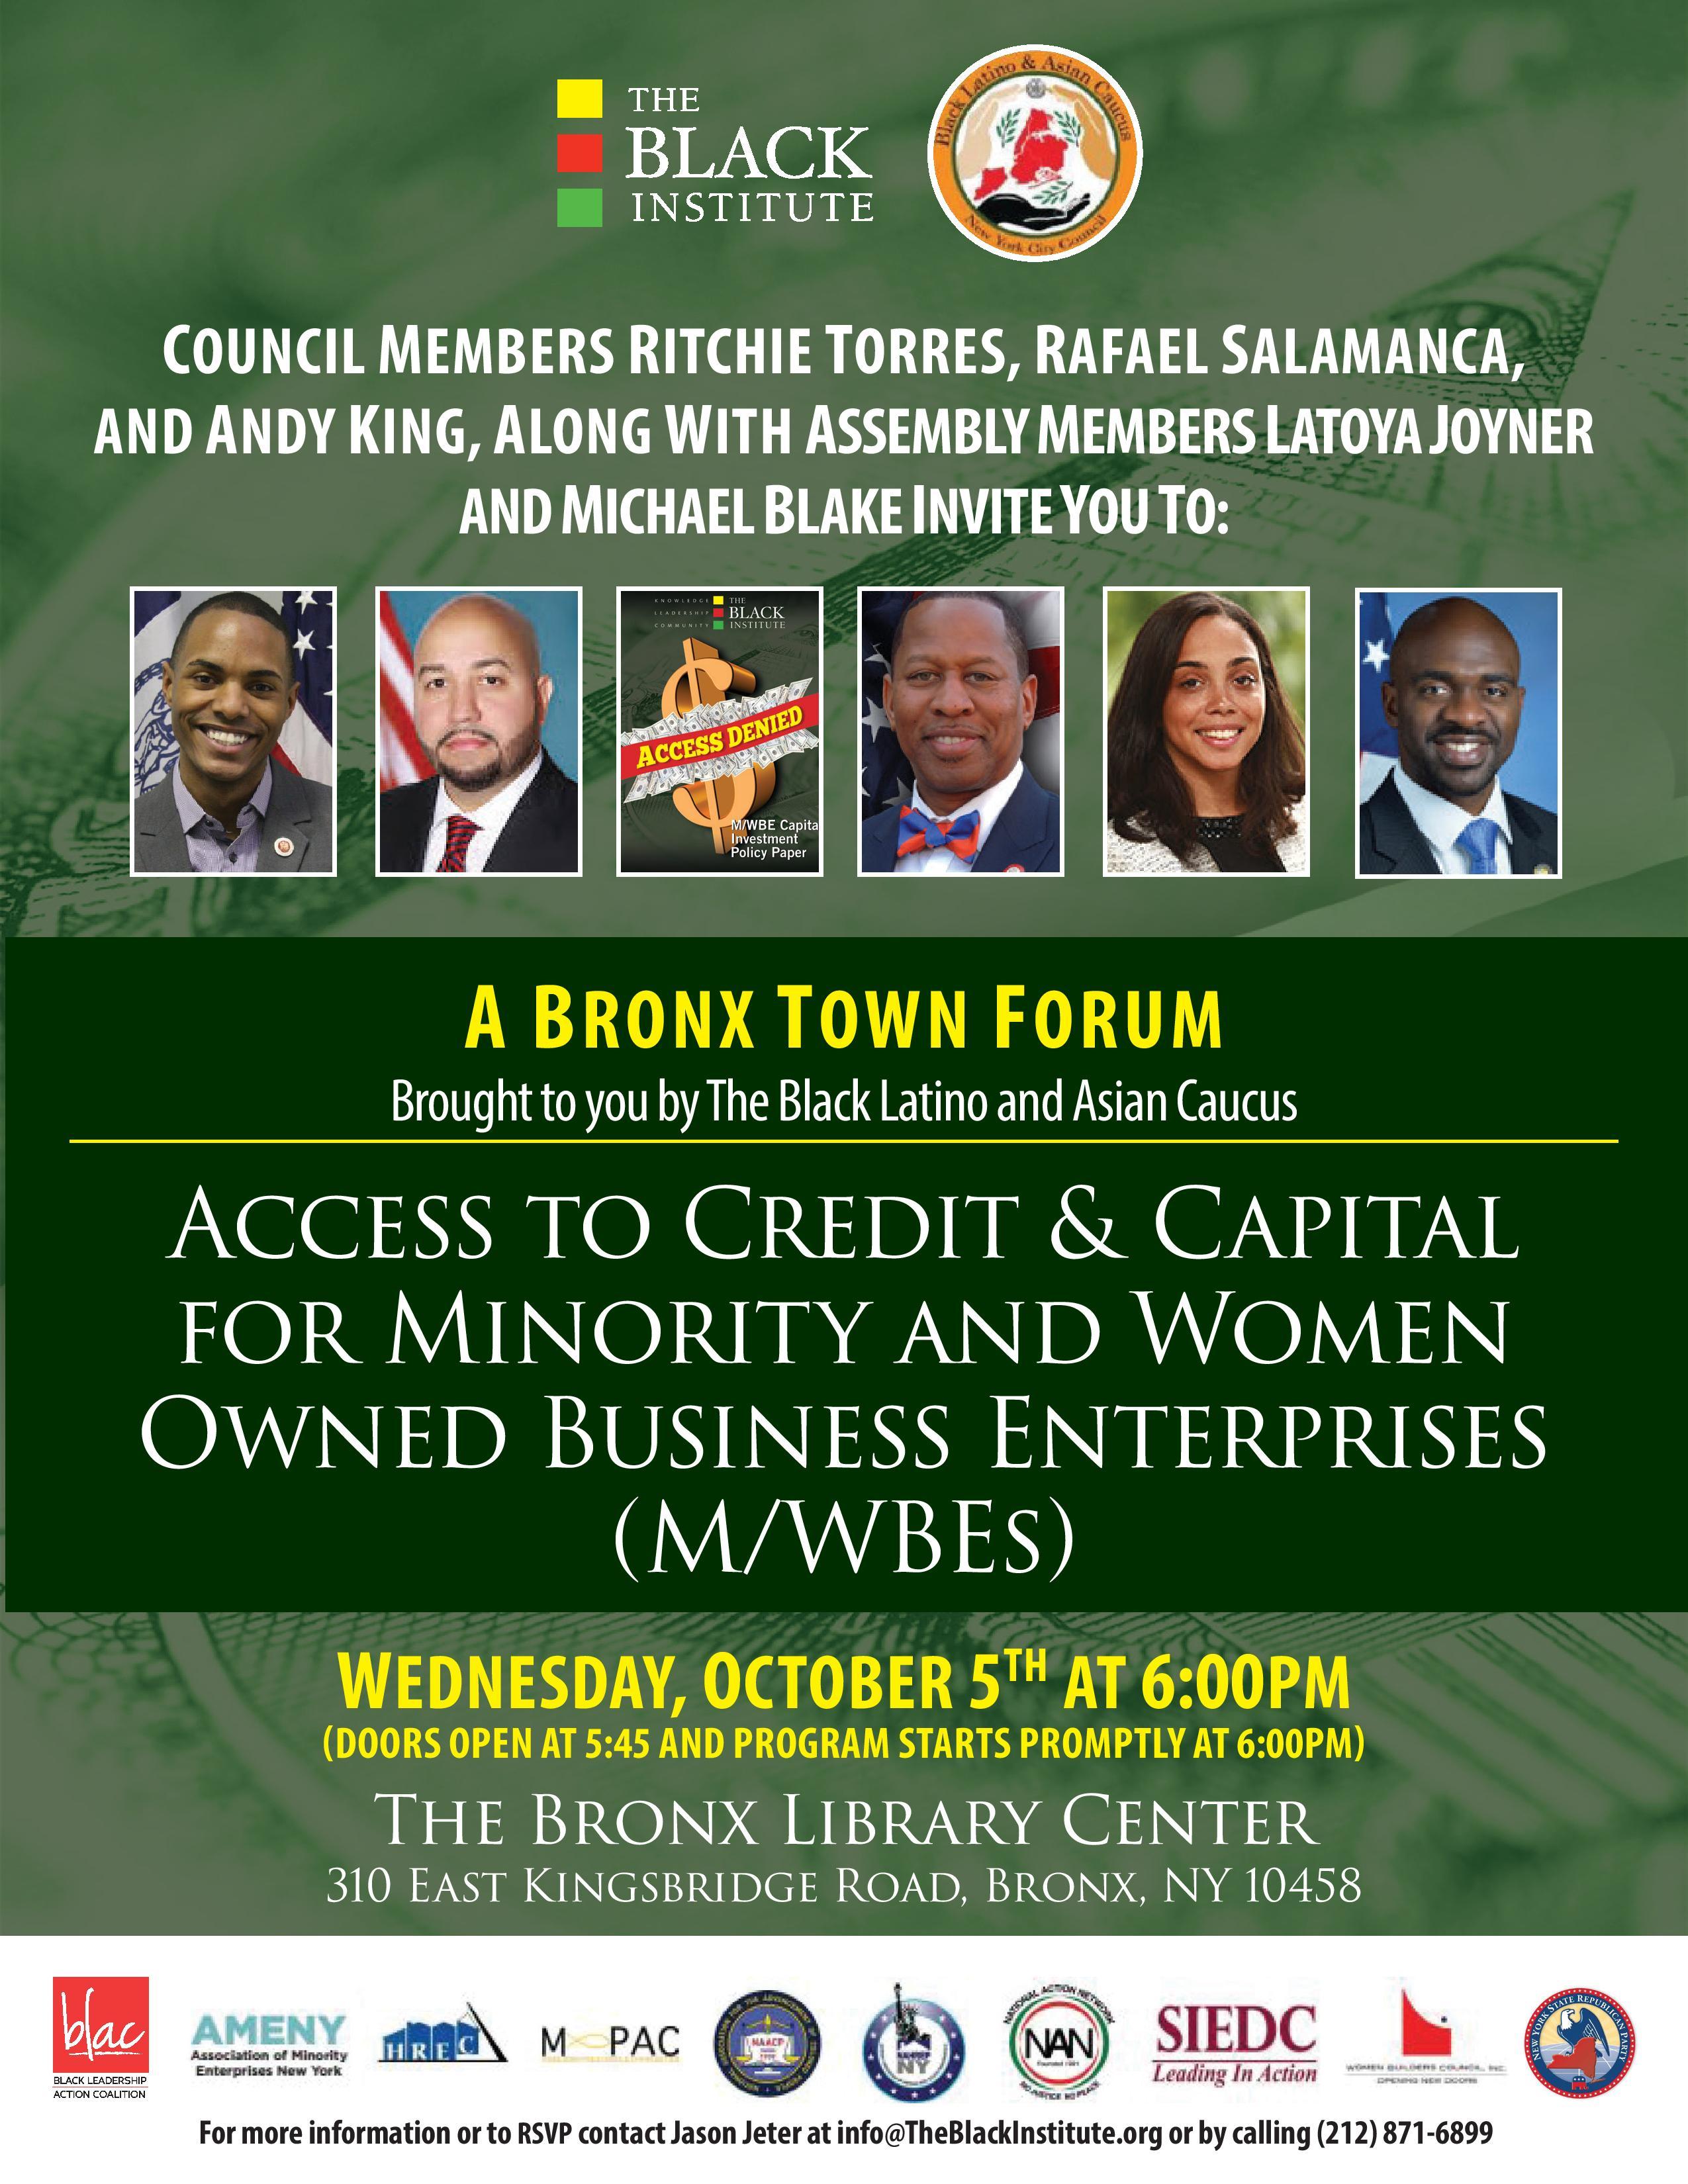 TBI-Bronx-page-001.jpg